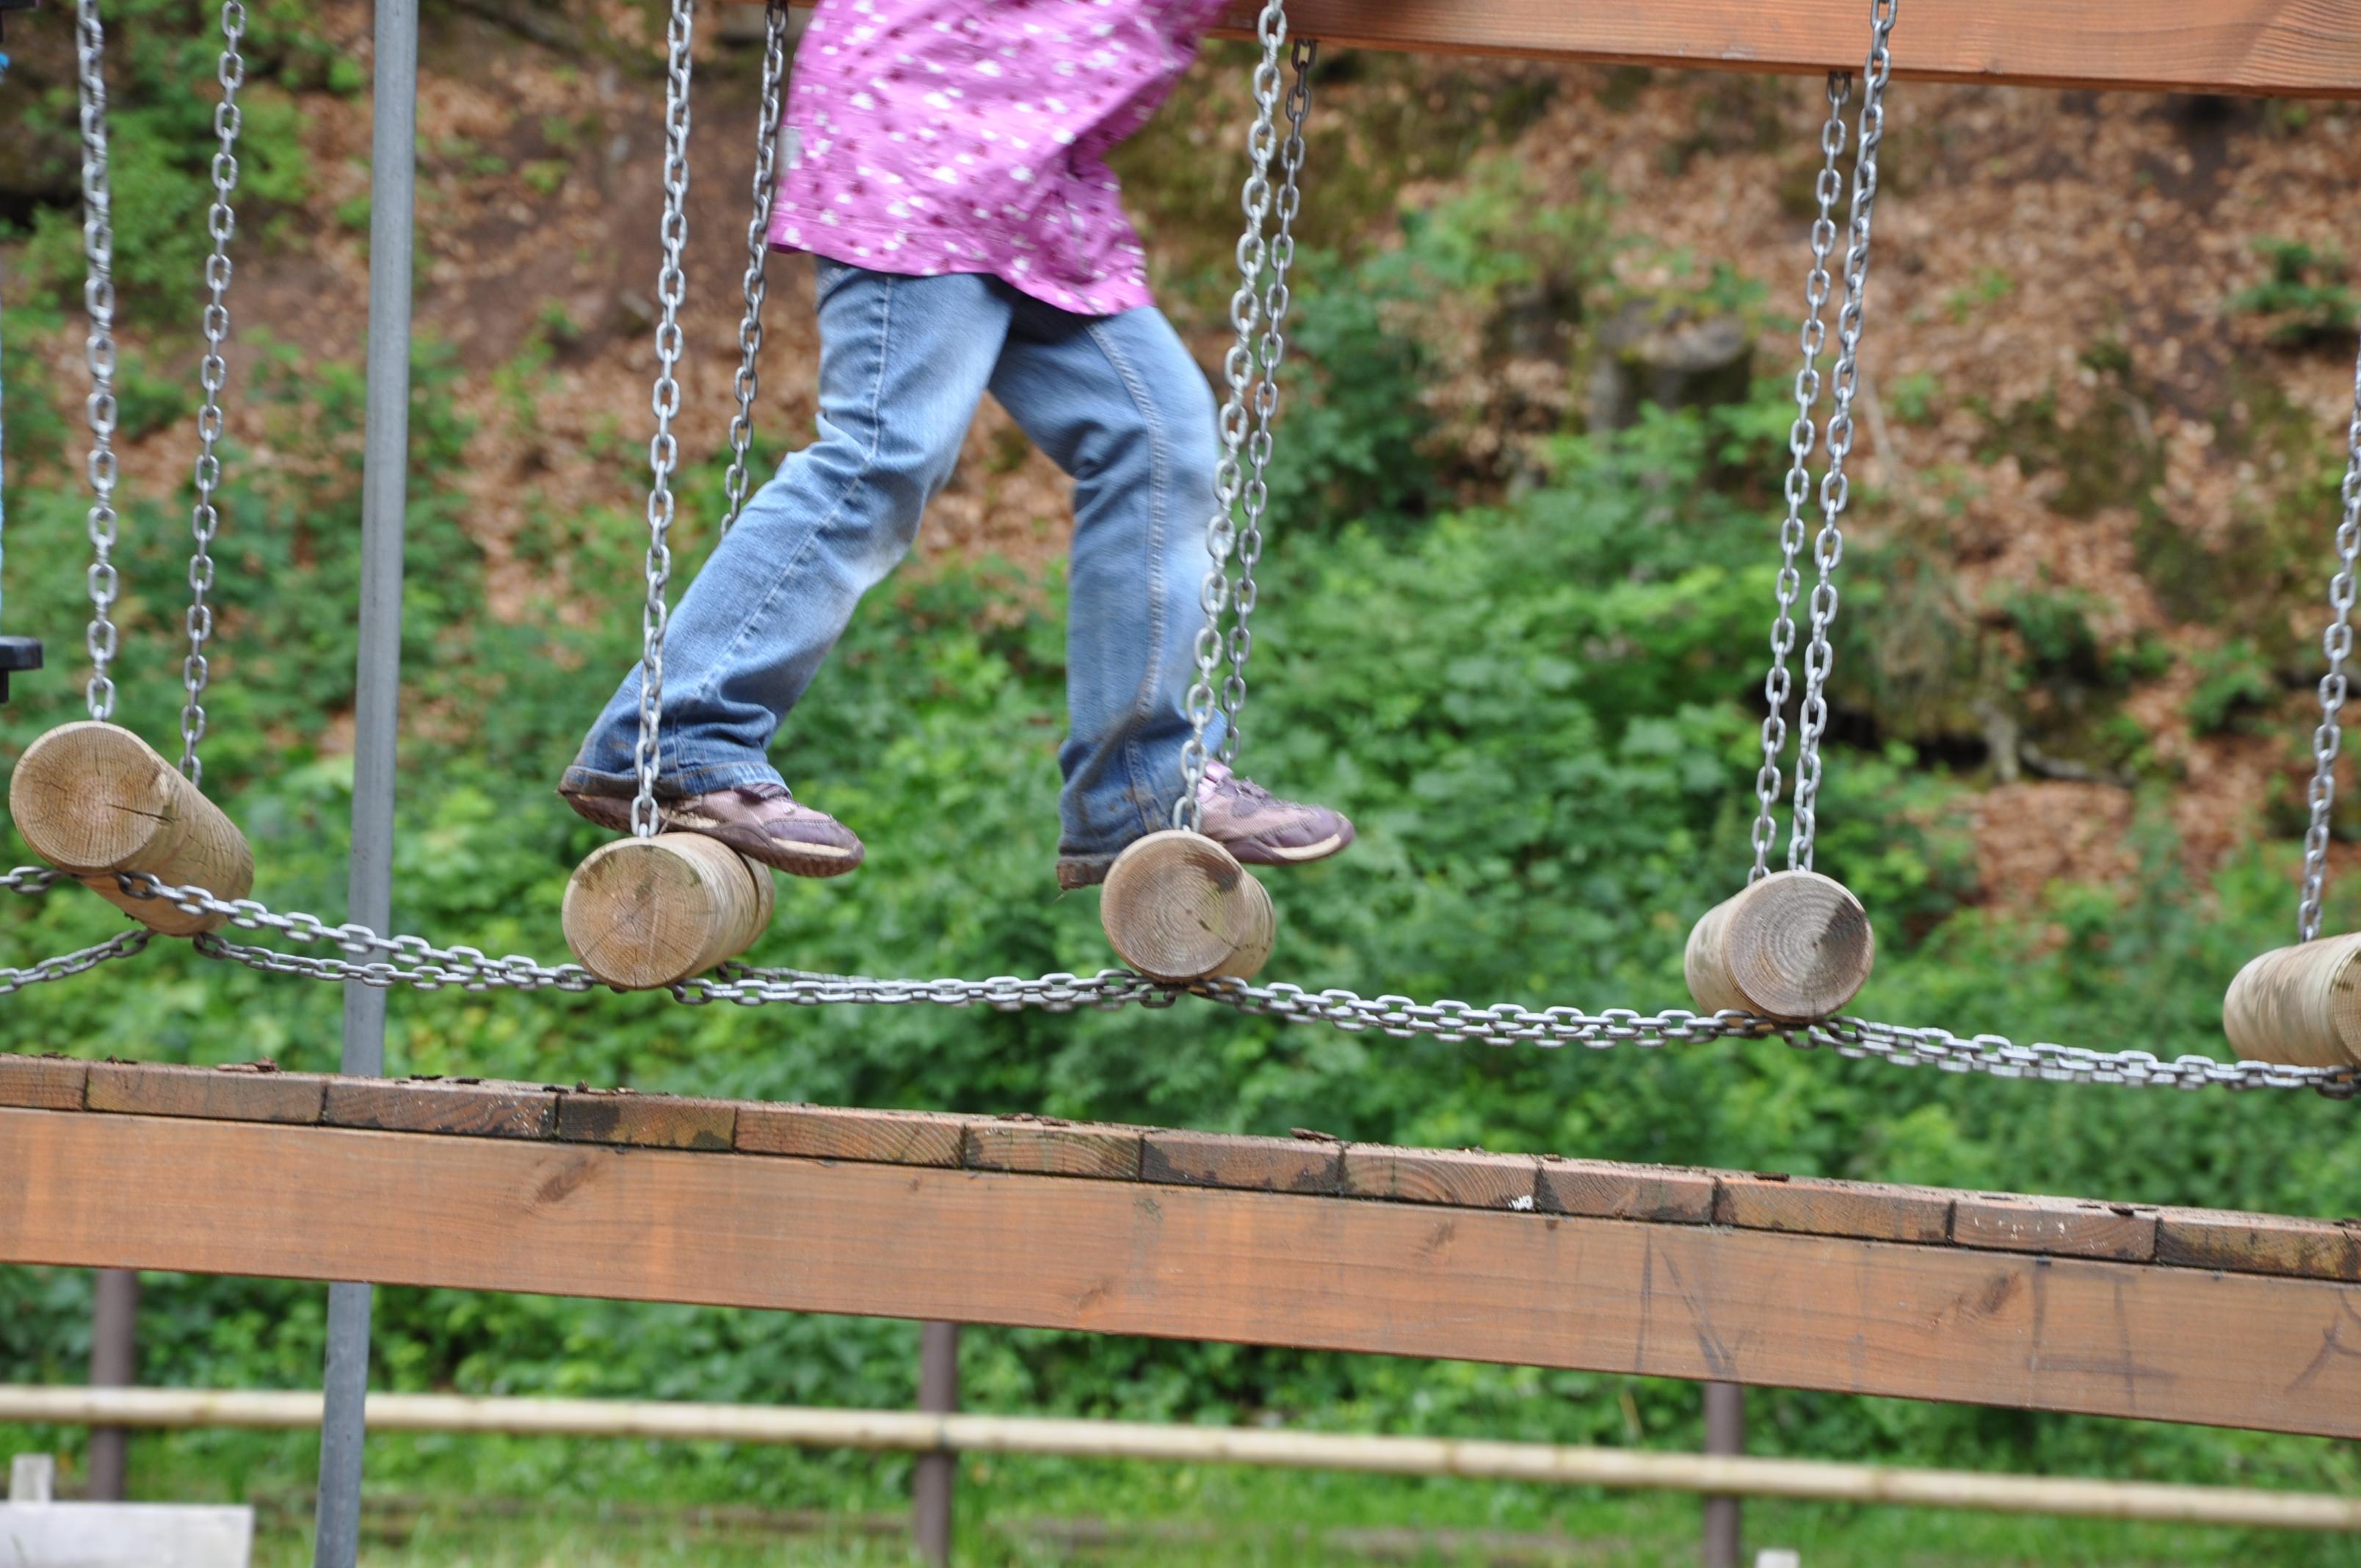 DSC_0113 Kinderbeine.jpg